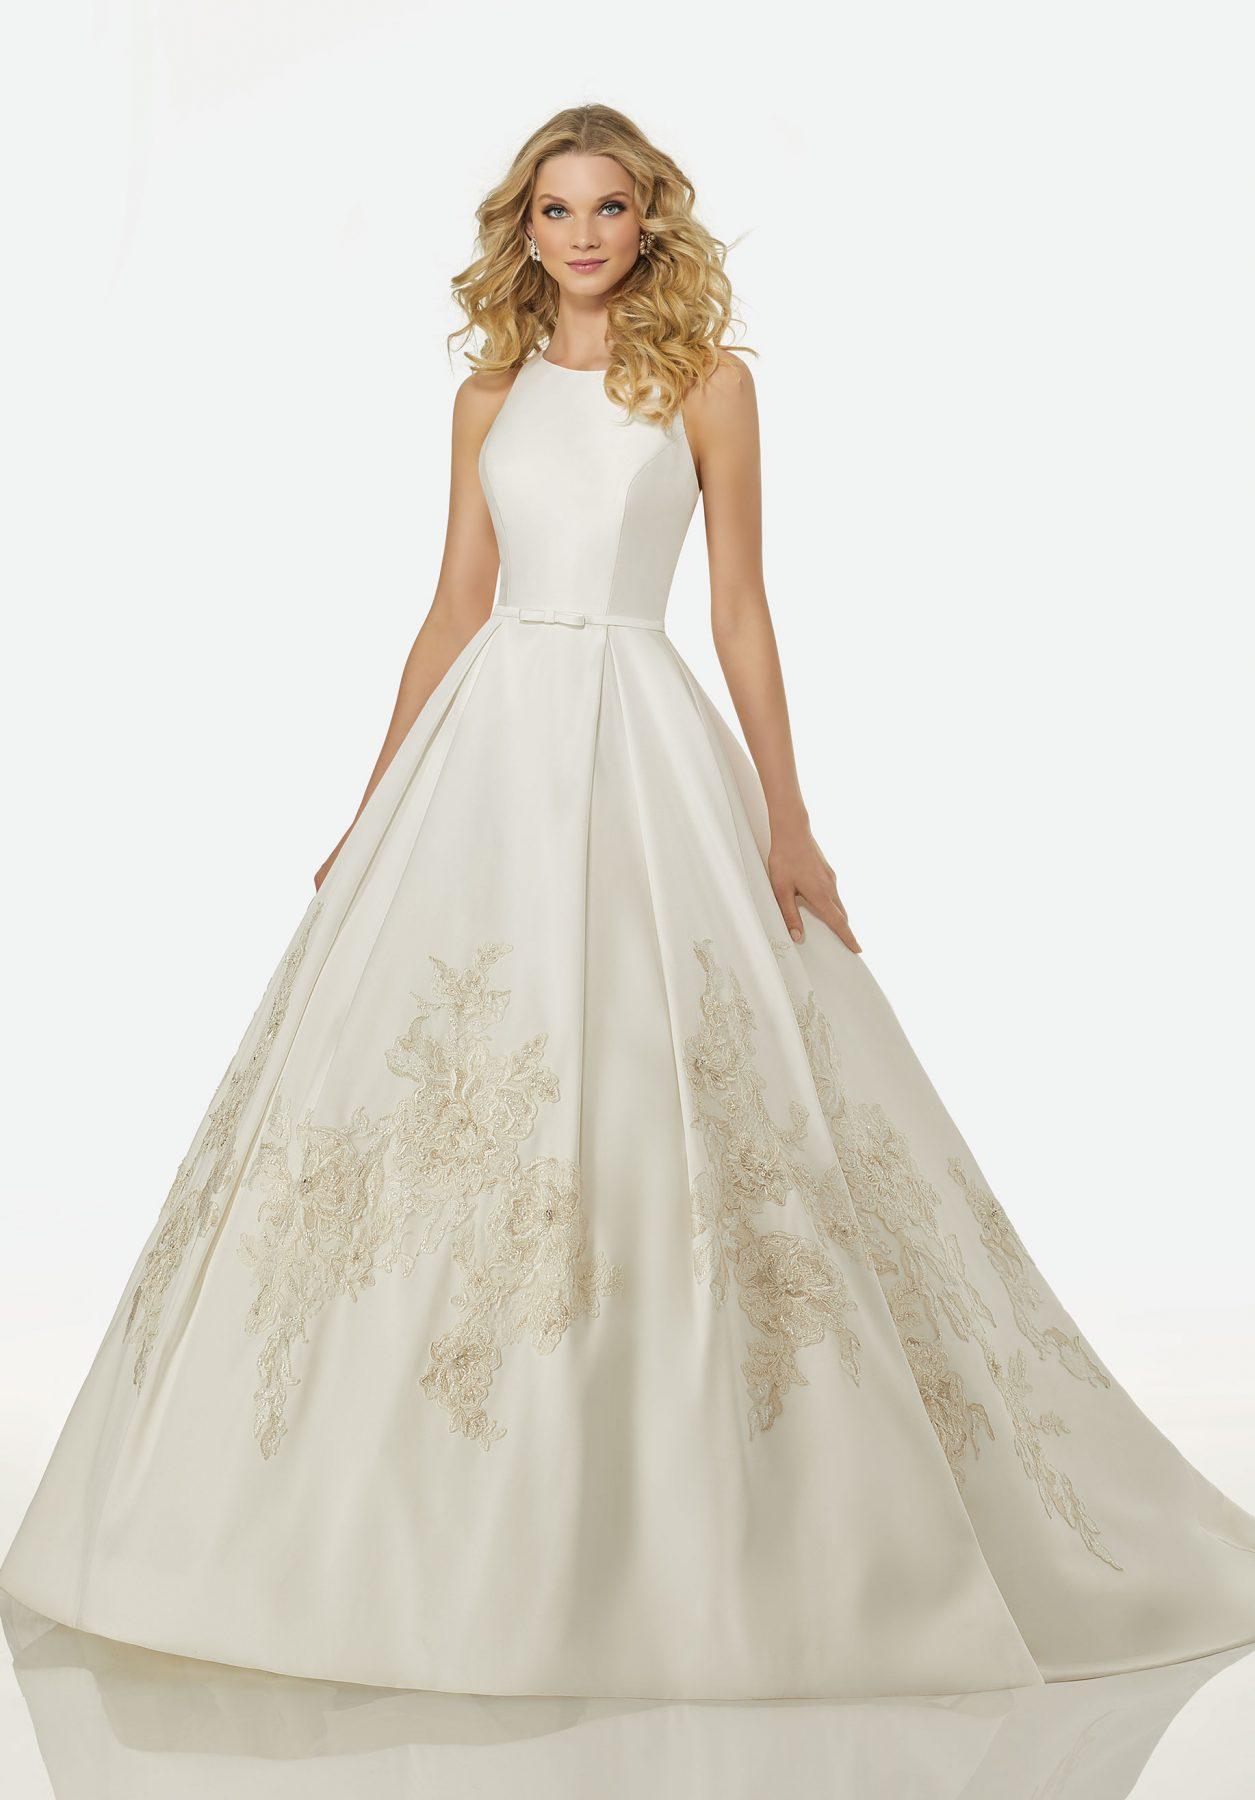 Simple Ball Gown Wedding Dress | Kleinfeld Bridal